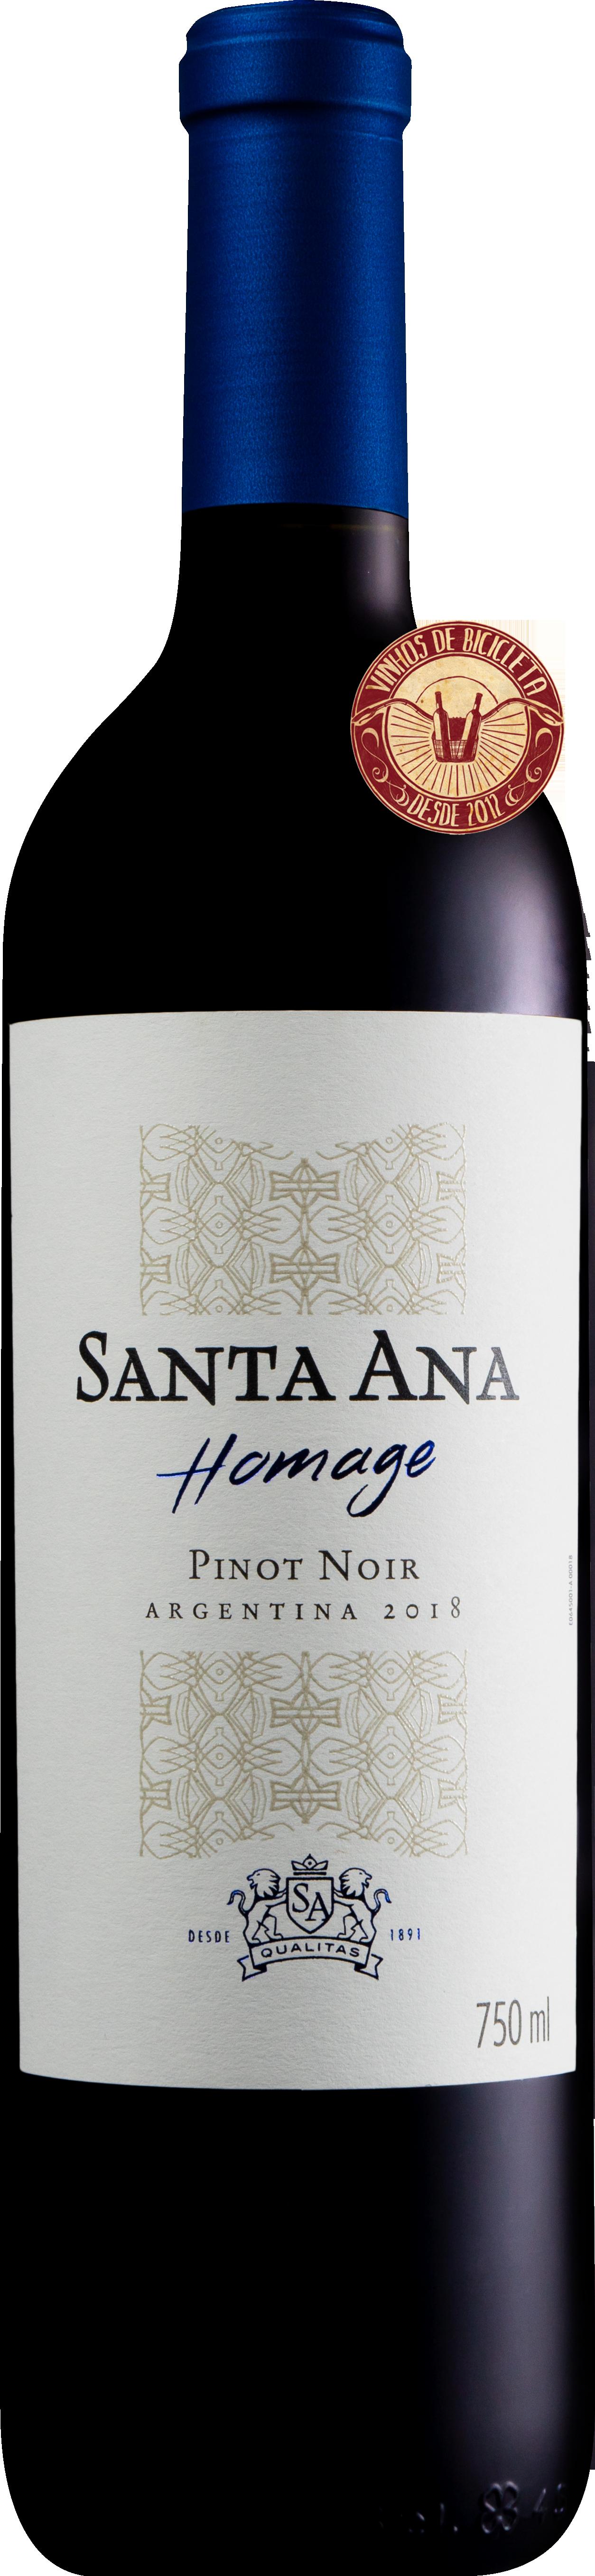 Santa Ana Homage Pinot Noir